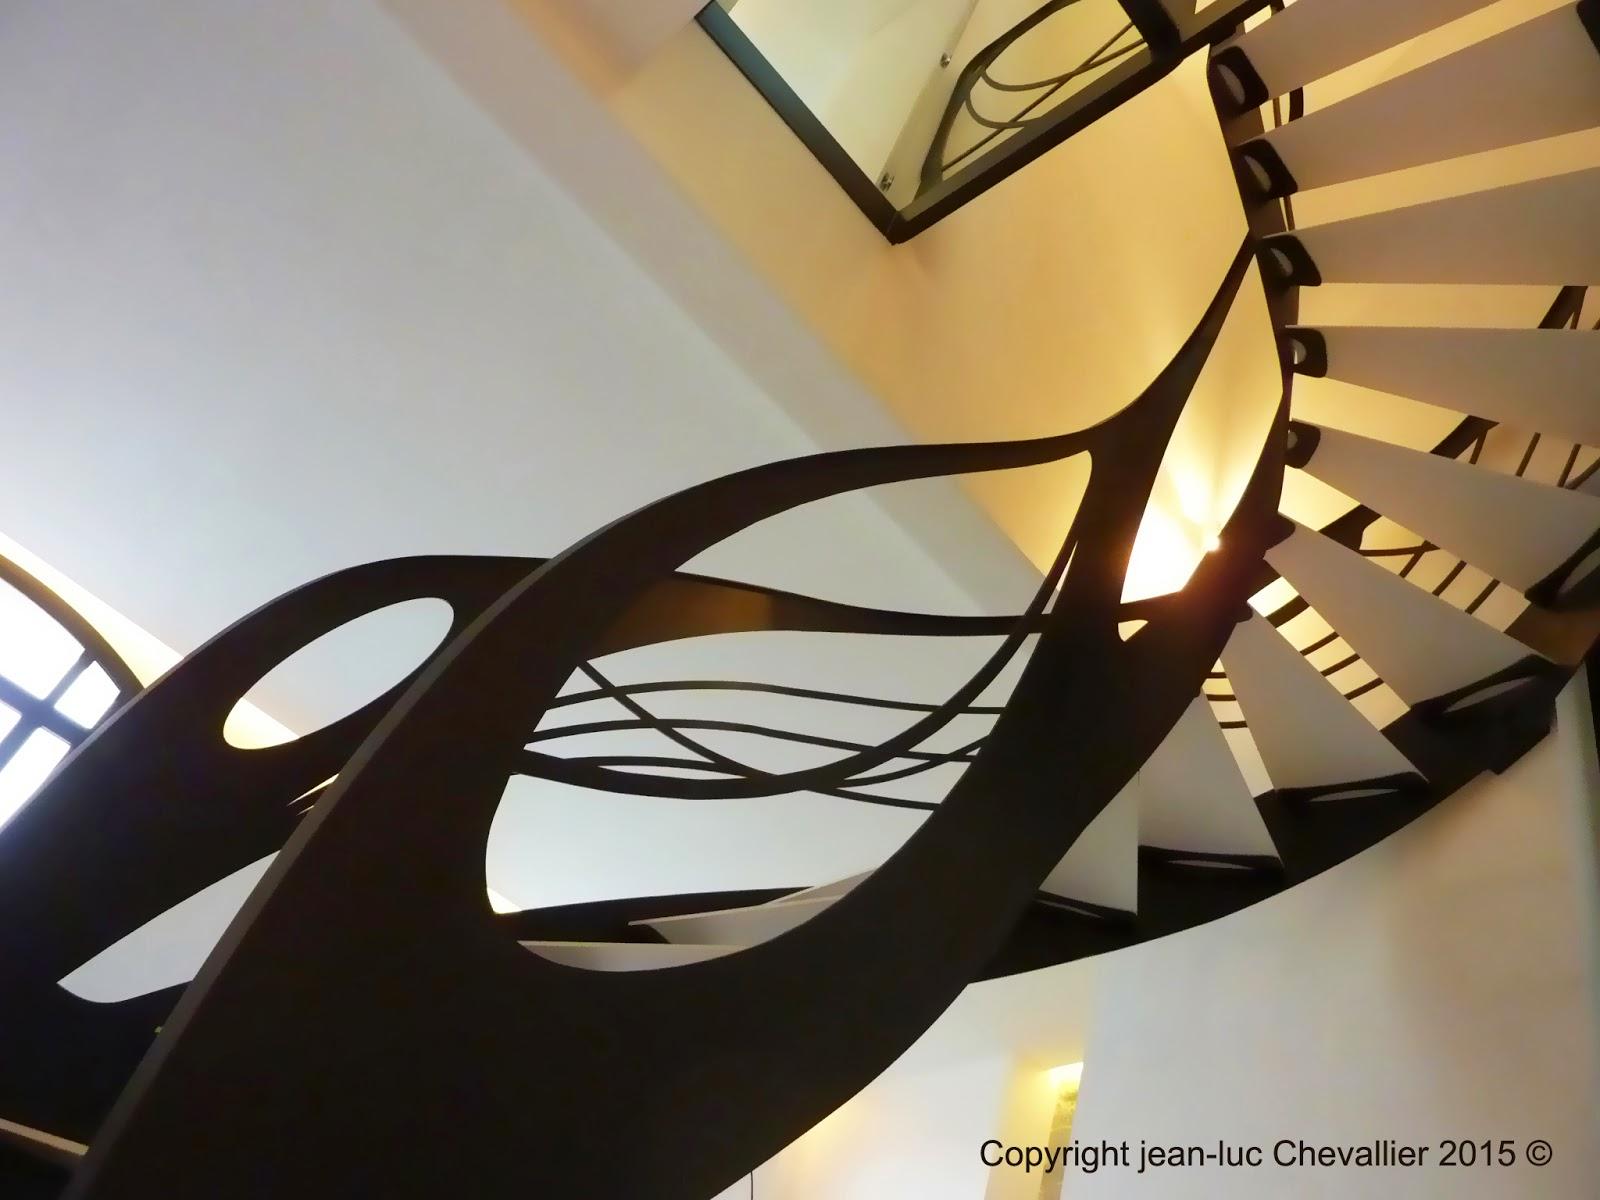 La stylique l escalier design d billard rencontre l art - Escalier debillarde ...